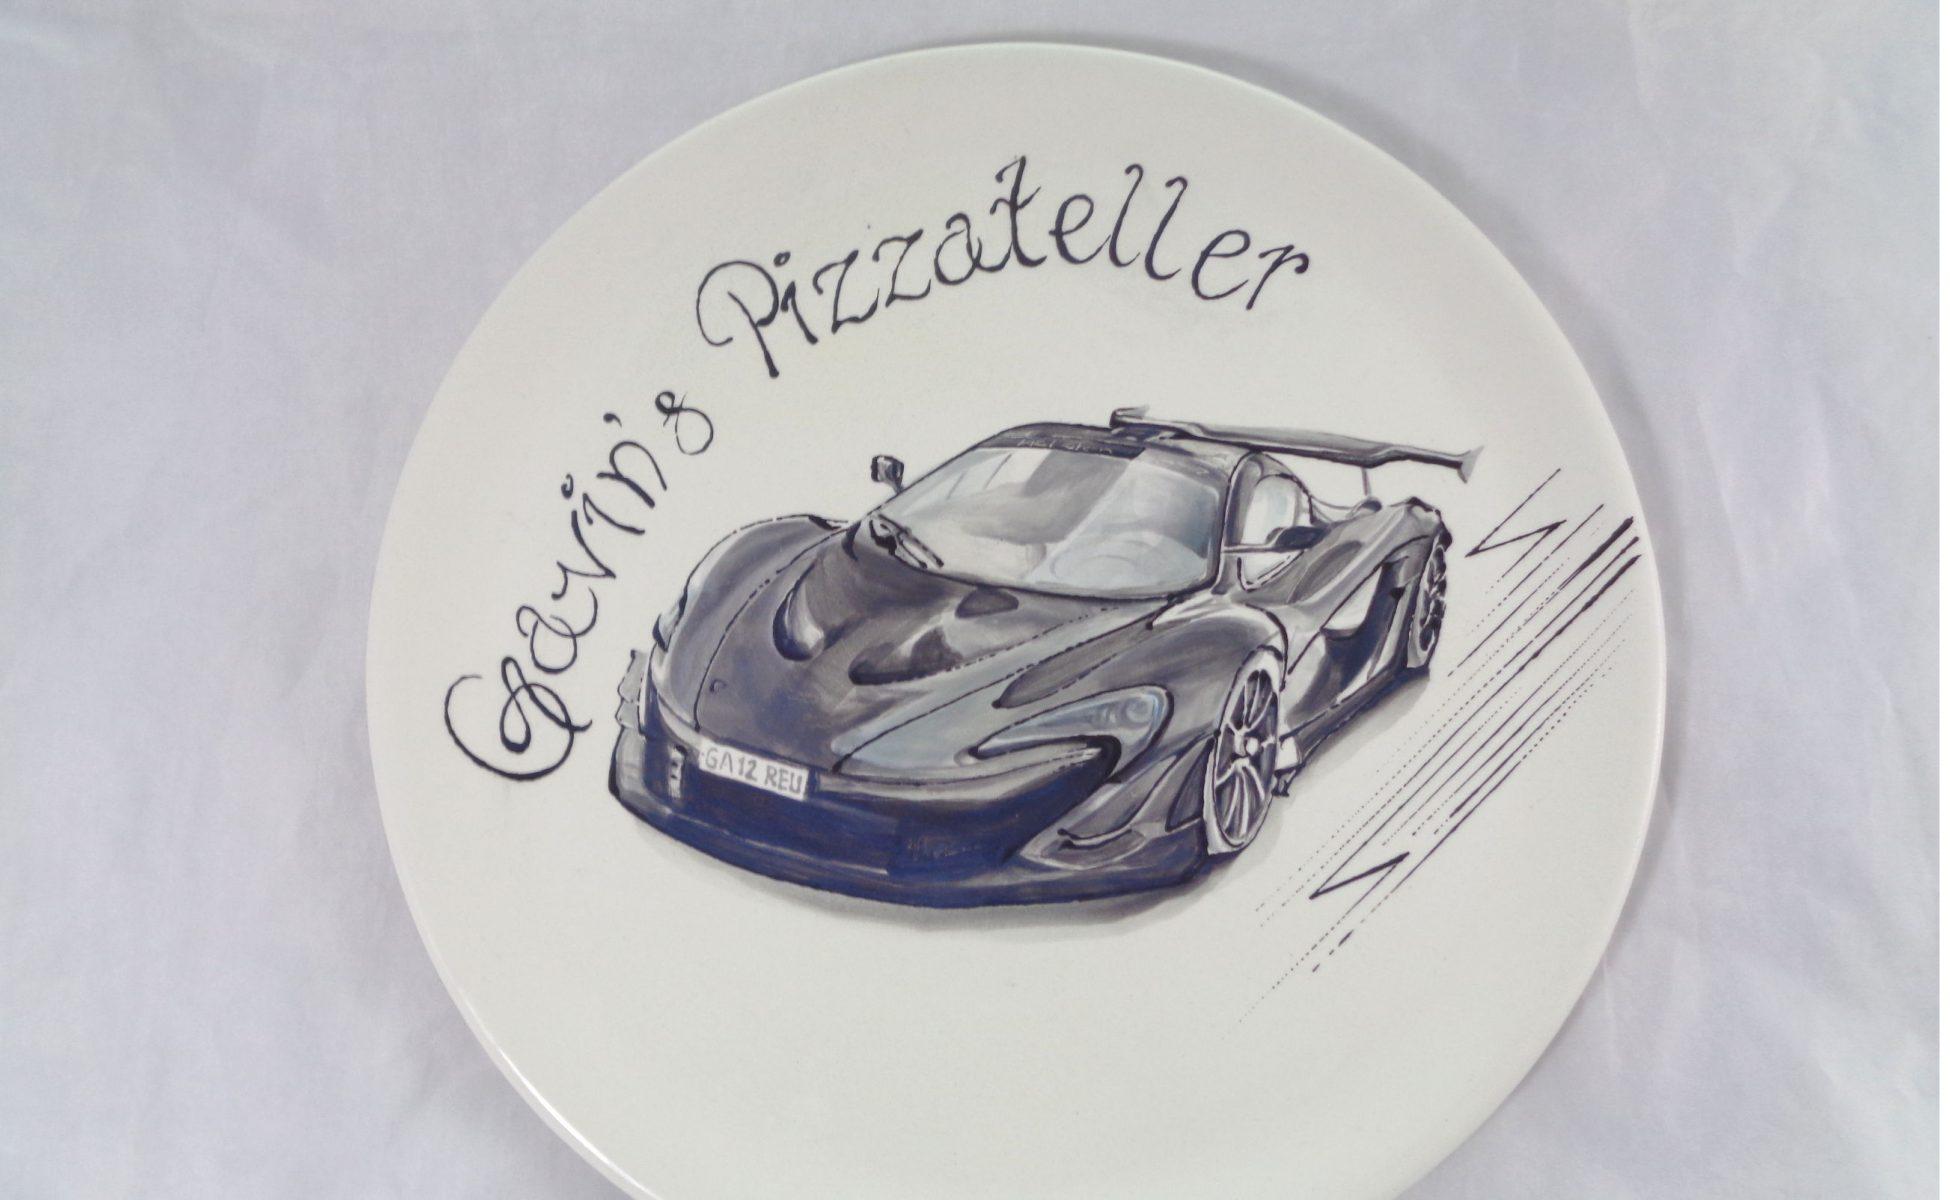 Bemalte Keramik Mc Laren P1 - Pizzateller